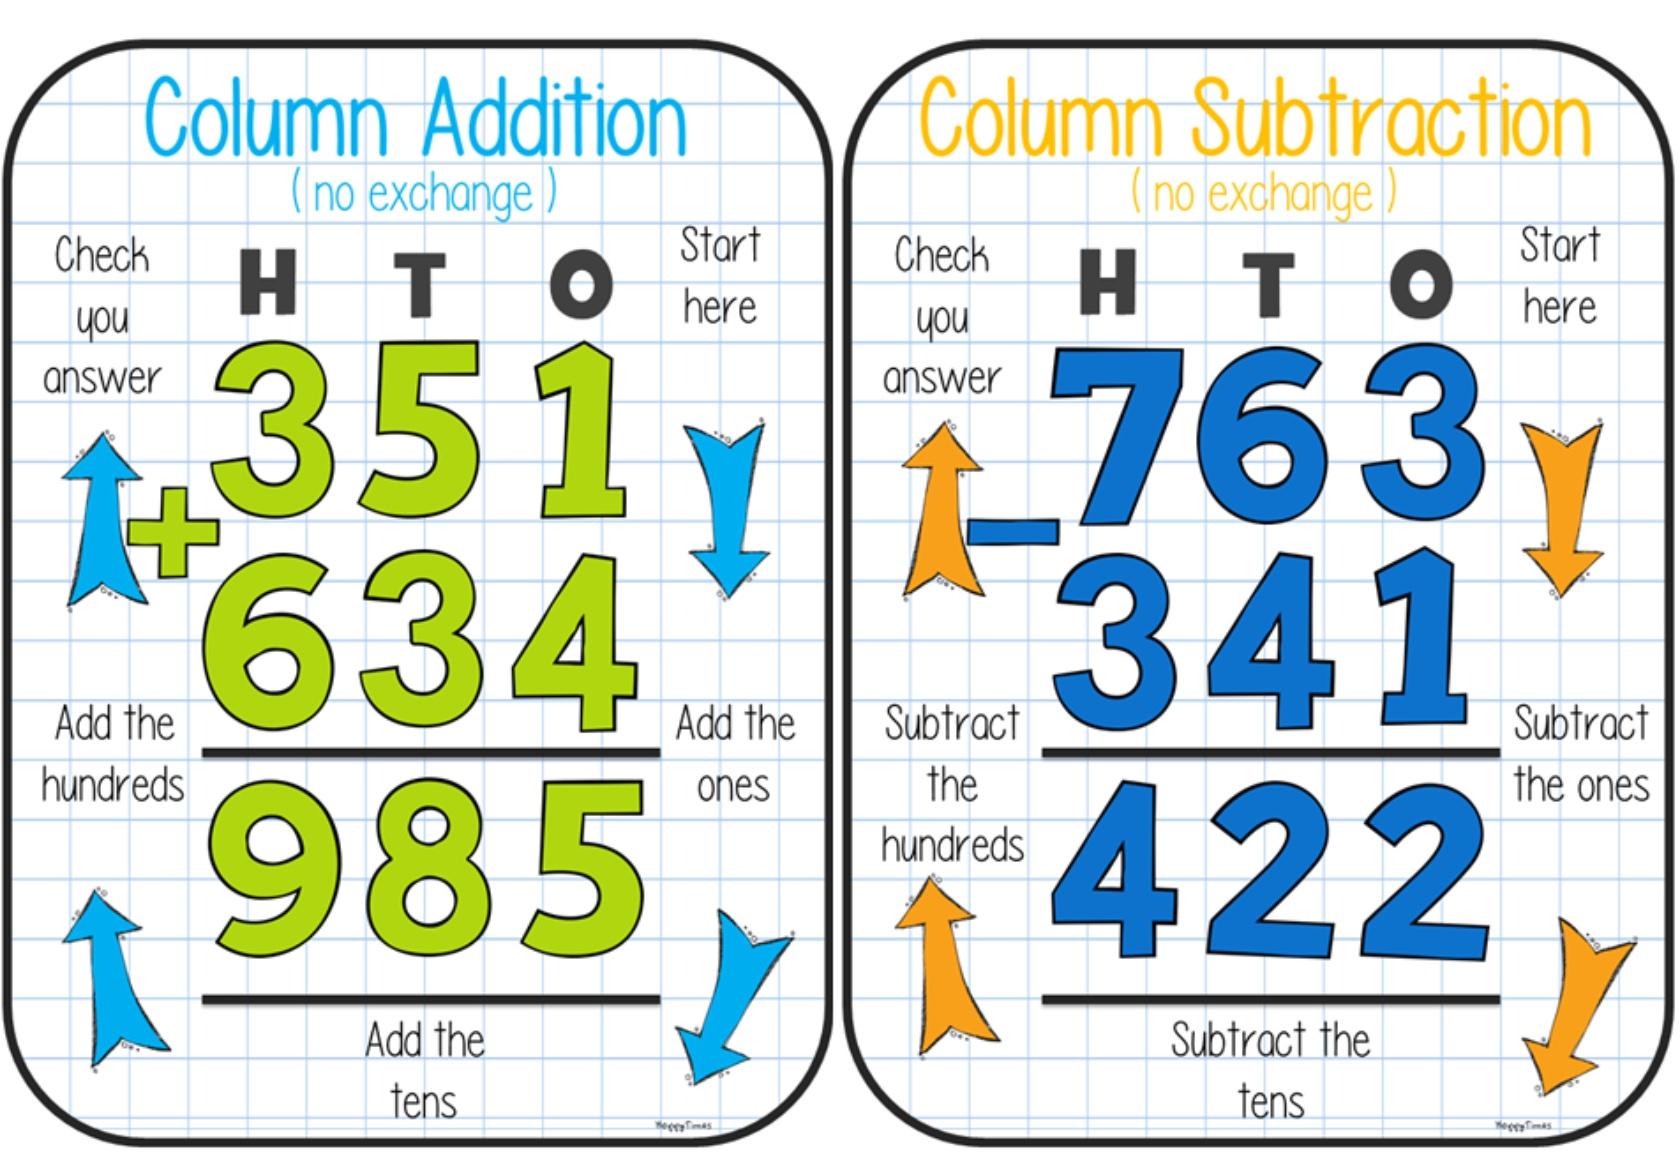 Column Addition And Subtraction Mathematics Quiz Quizizz Quizizz adding and subtracting